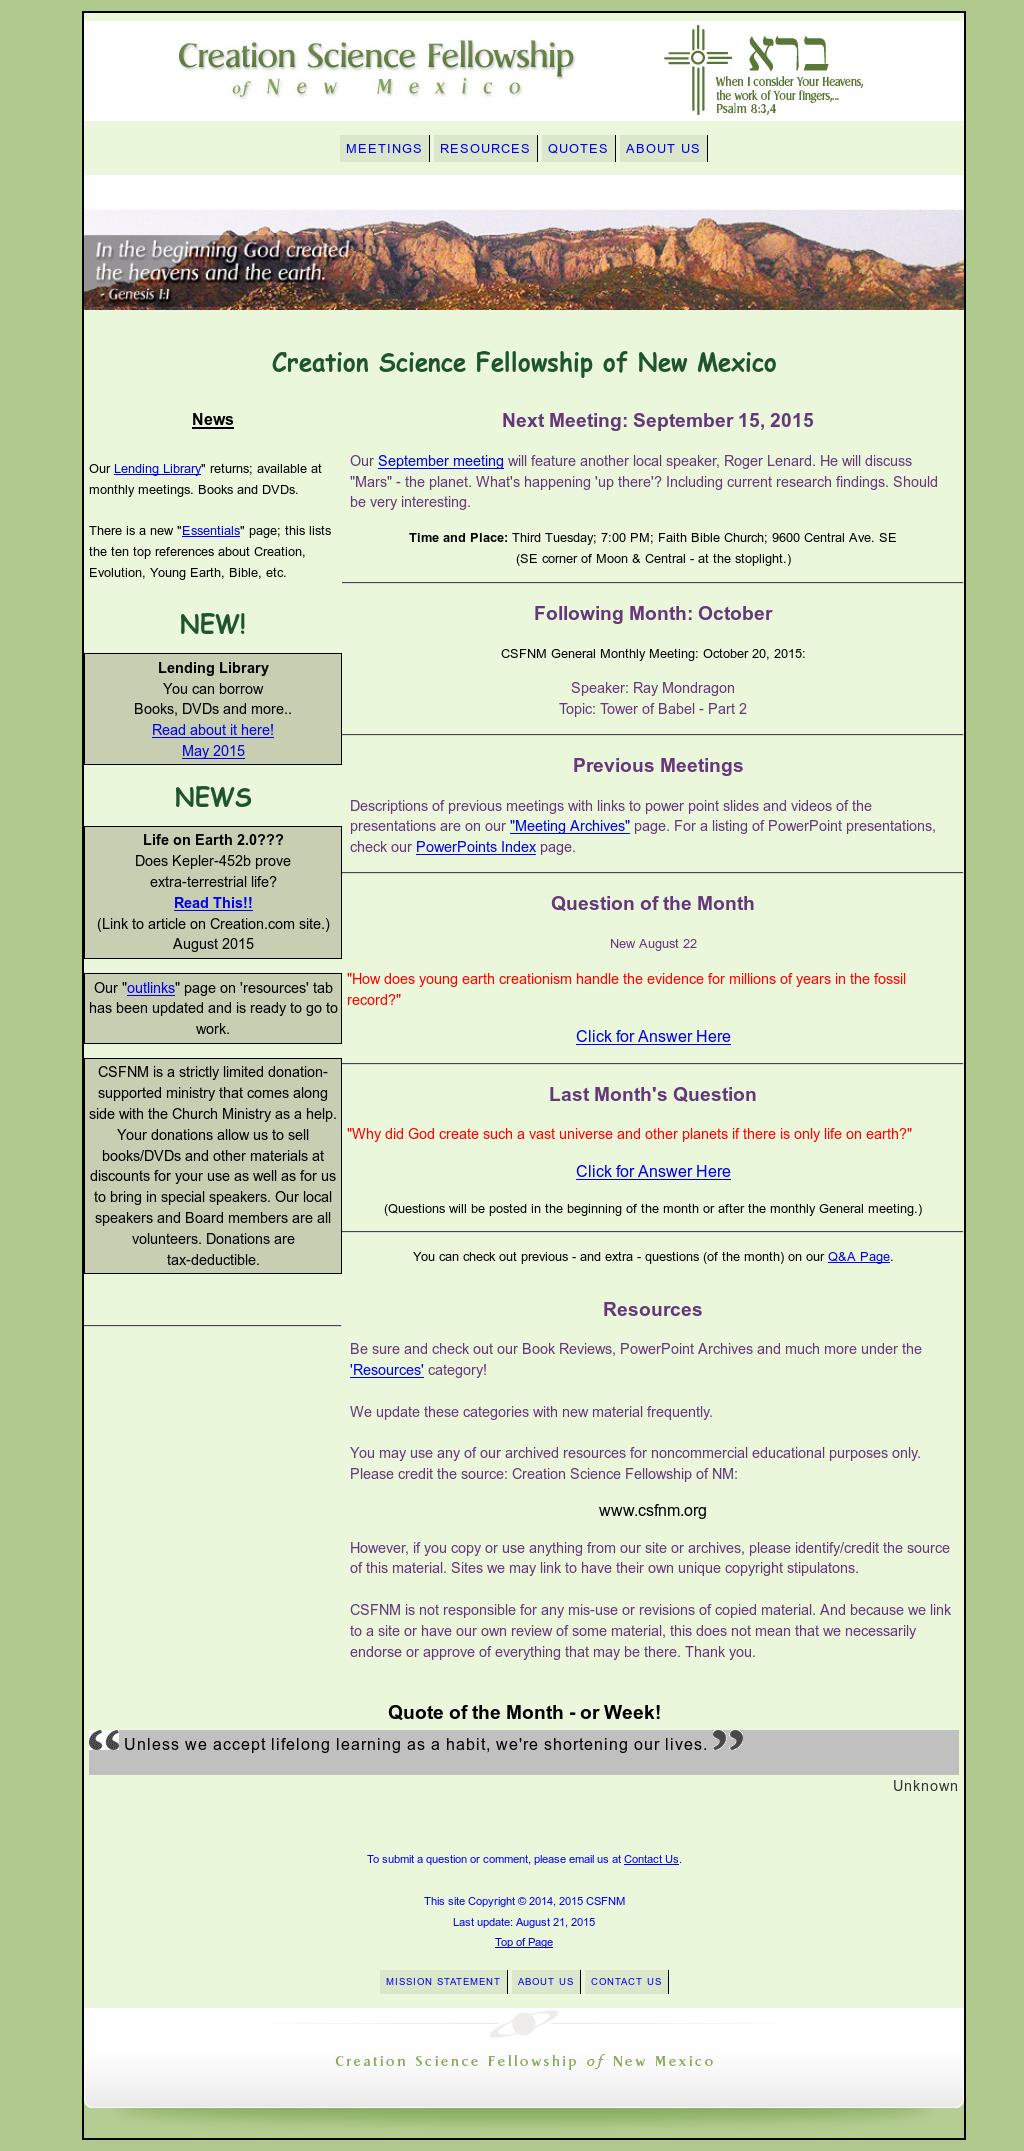 Csfnm Competitors, Revenue and Employees - Owler Company Profile